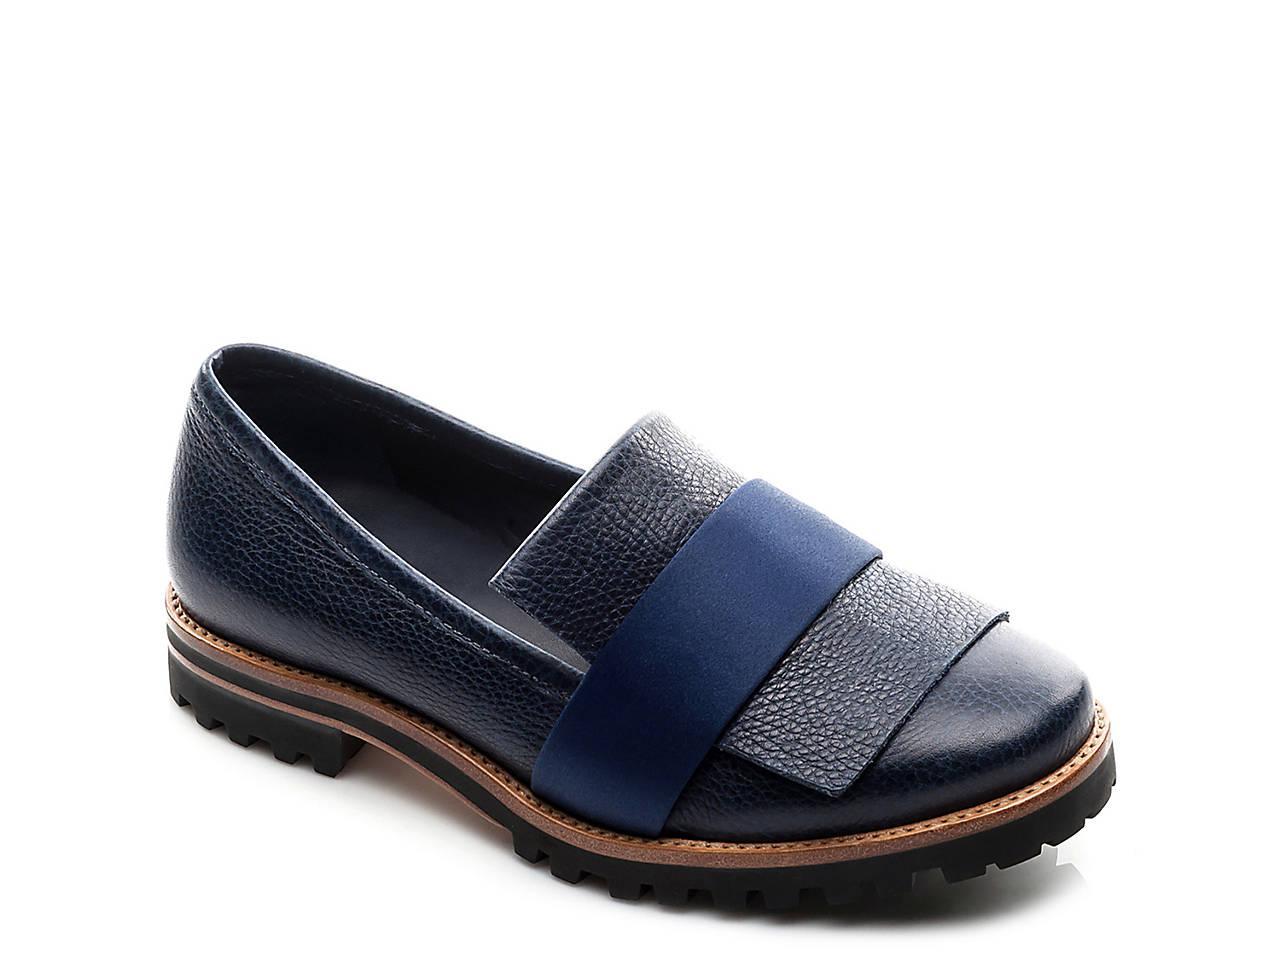 06637d3fb5b Bernardo Ora Loafer Men s Shoes